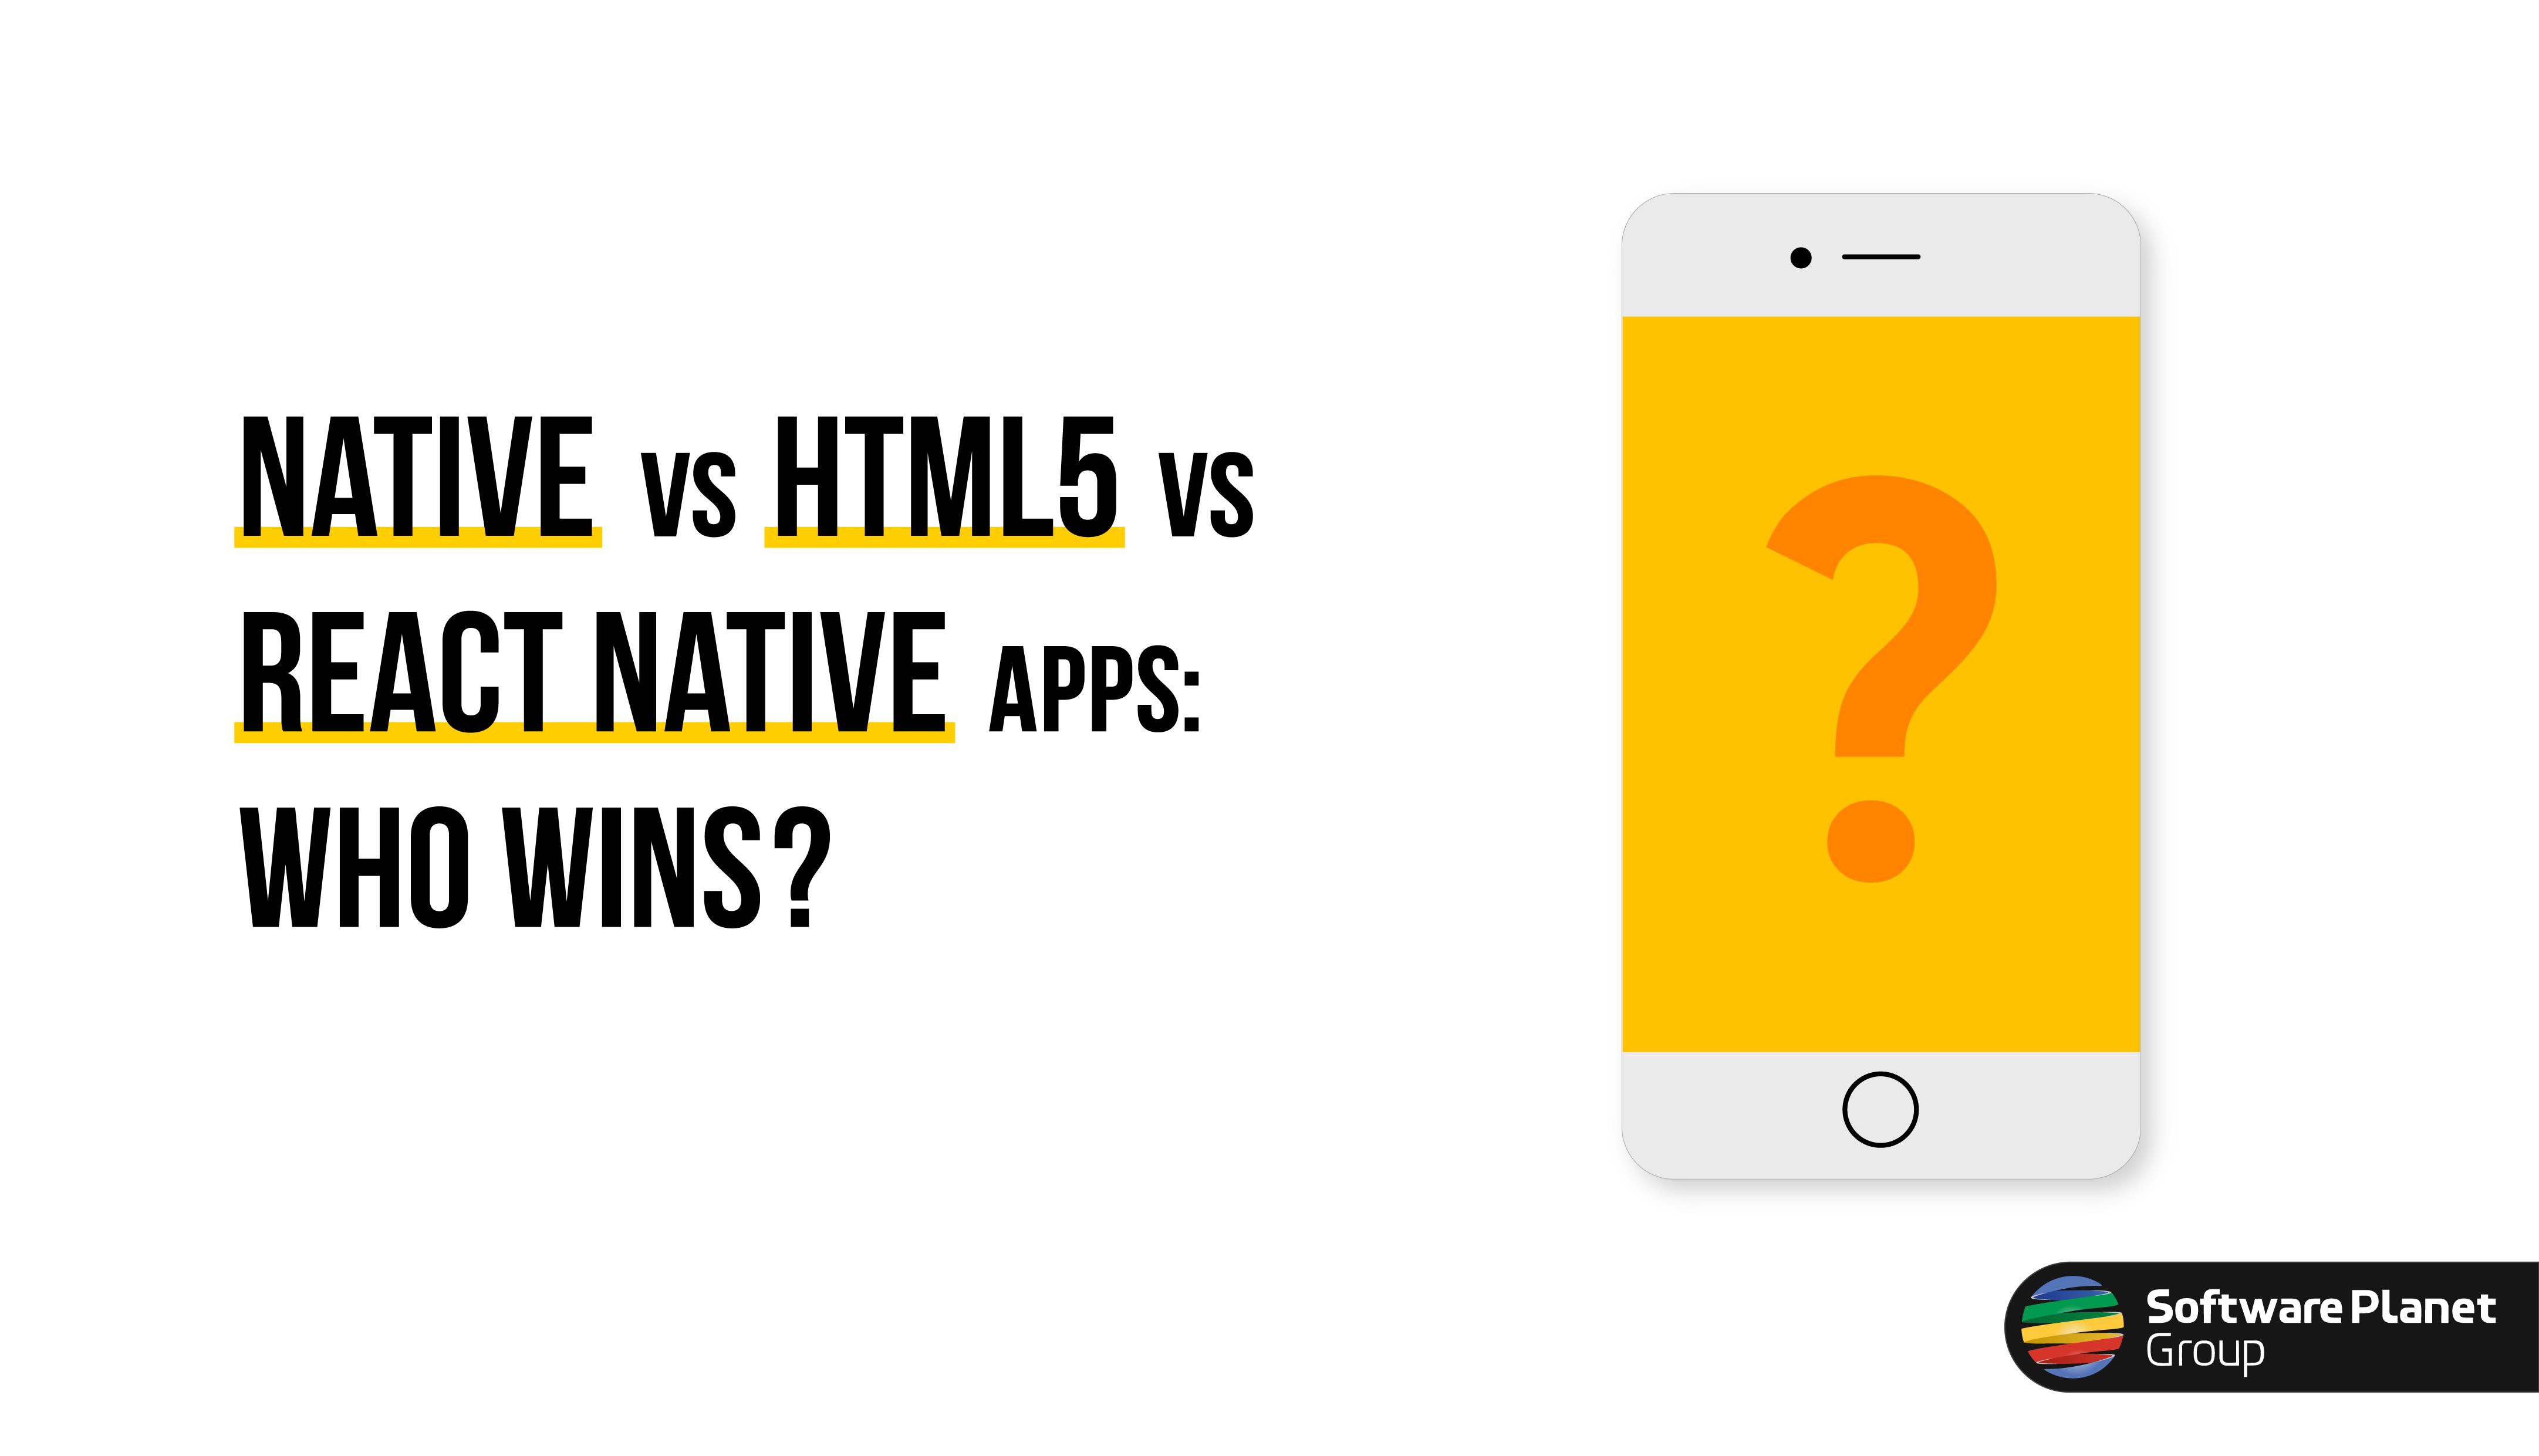 Native vs HTML5 vs React Native: Who Wins?